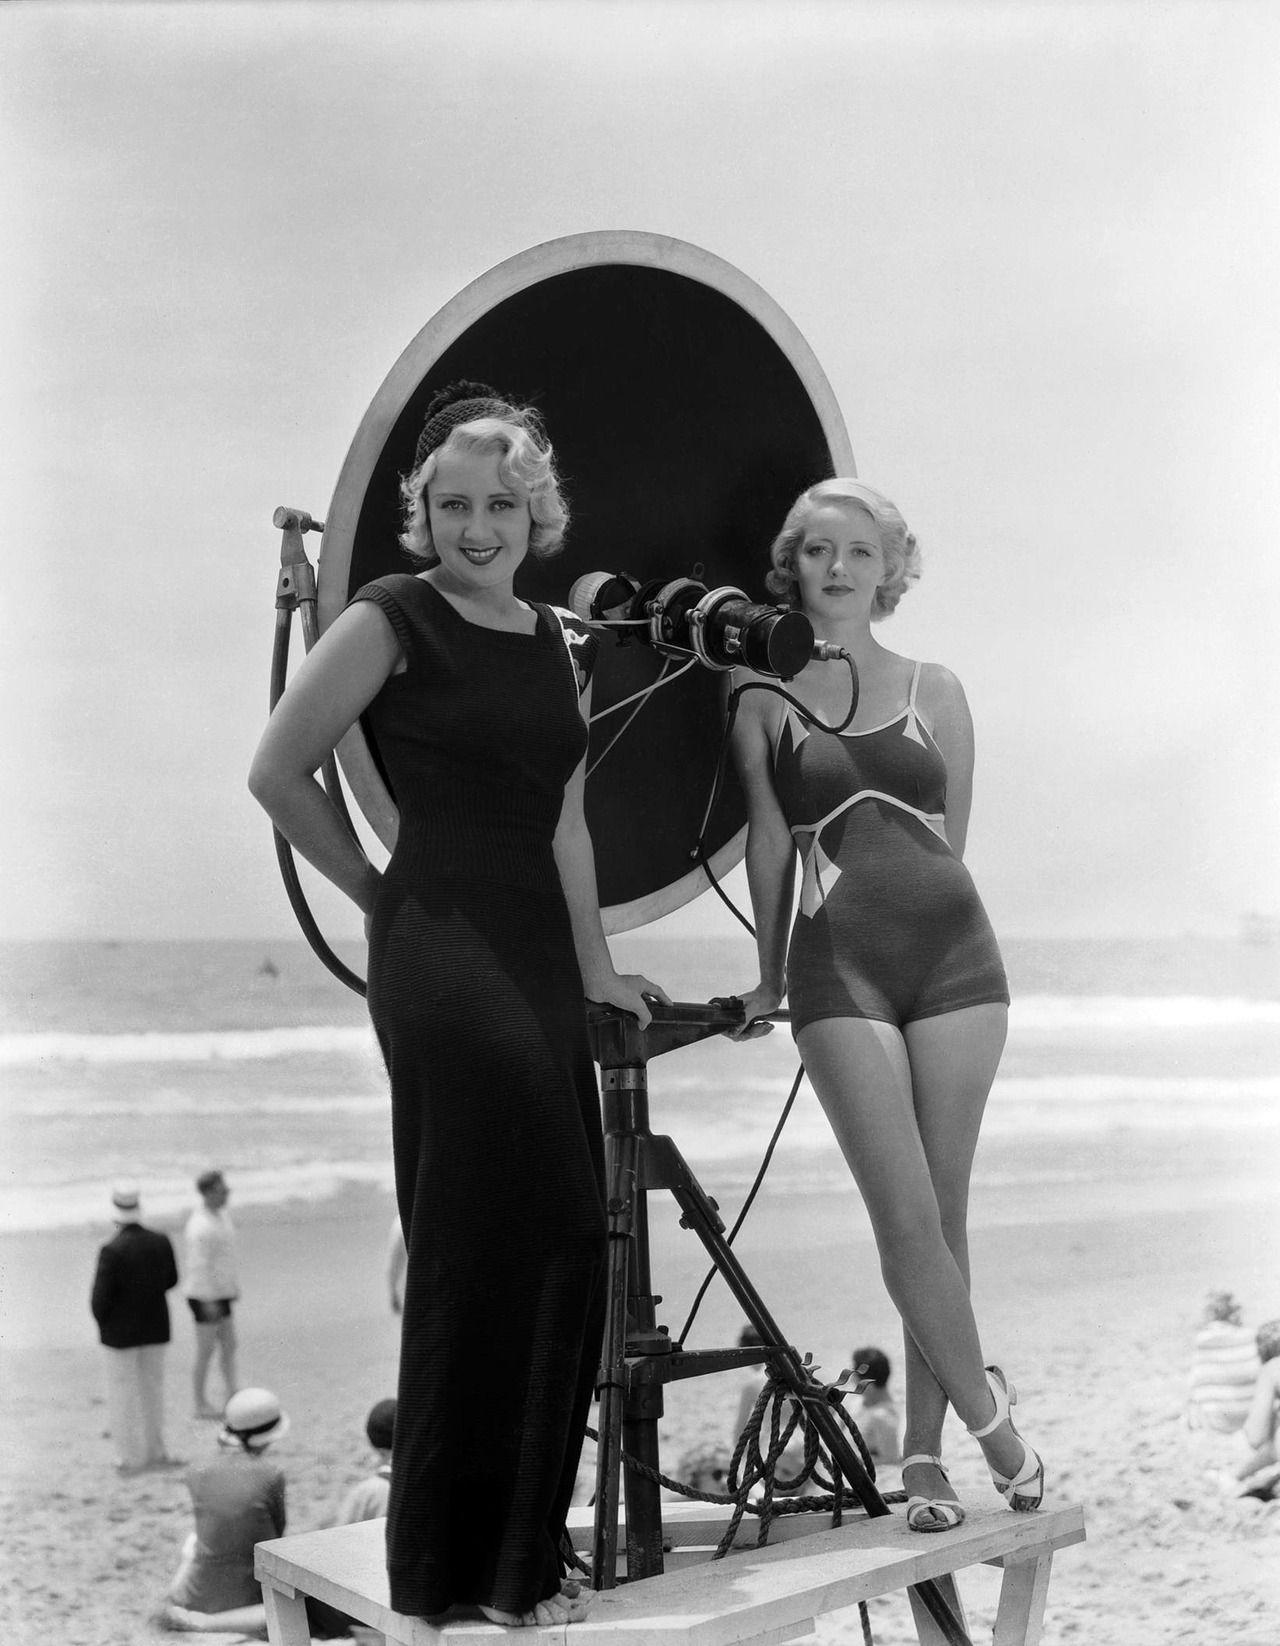 Joan blonde nude photo s